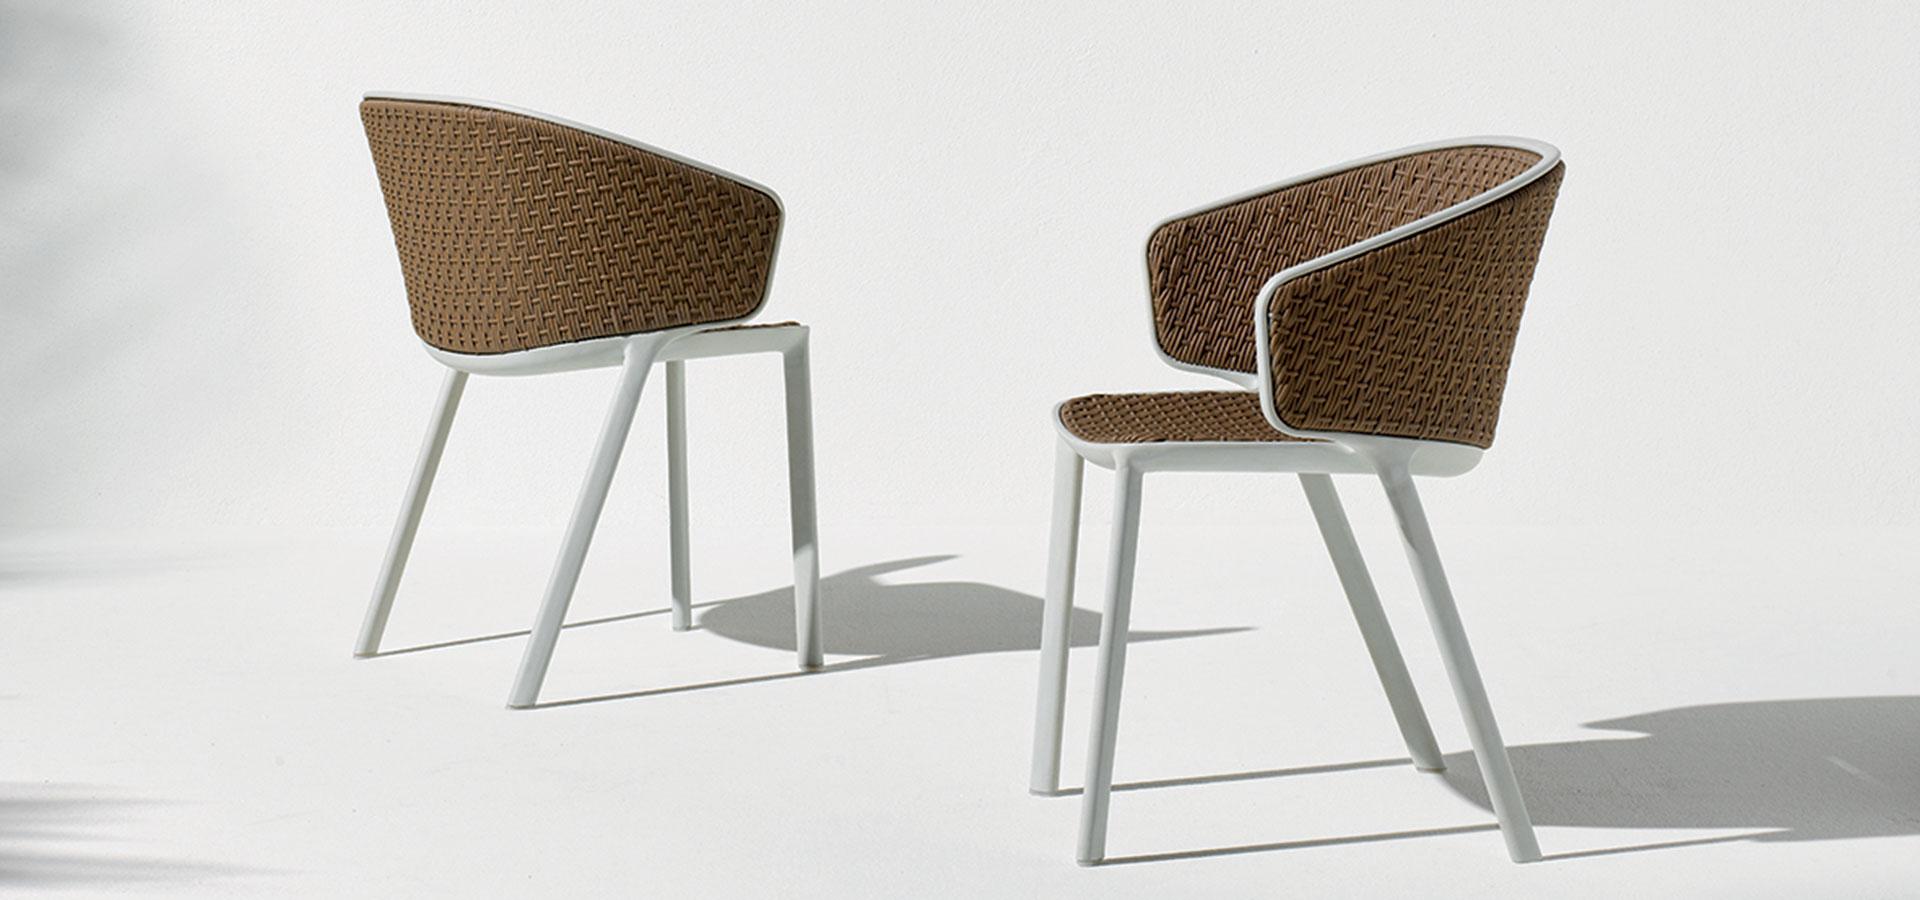 Pluvia la cadira tienda de sillas barcelona sillas de estilo barcelona sillas de oficina - Cadira barcelona ...